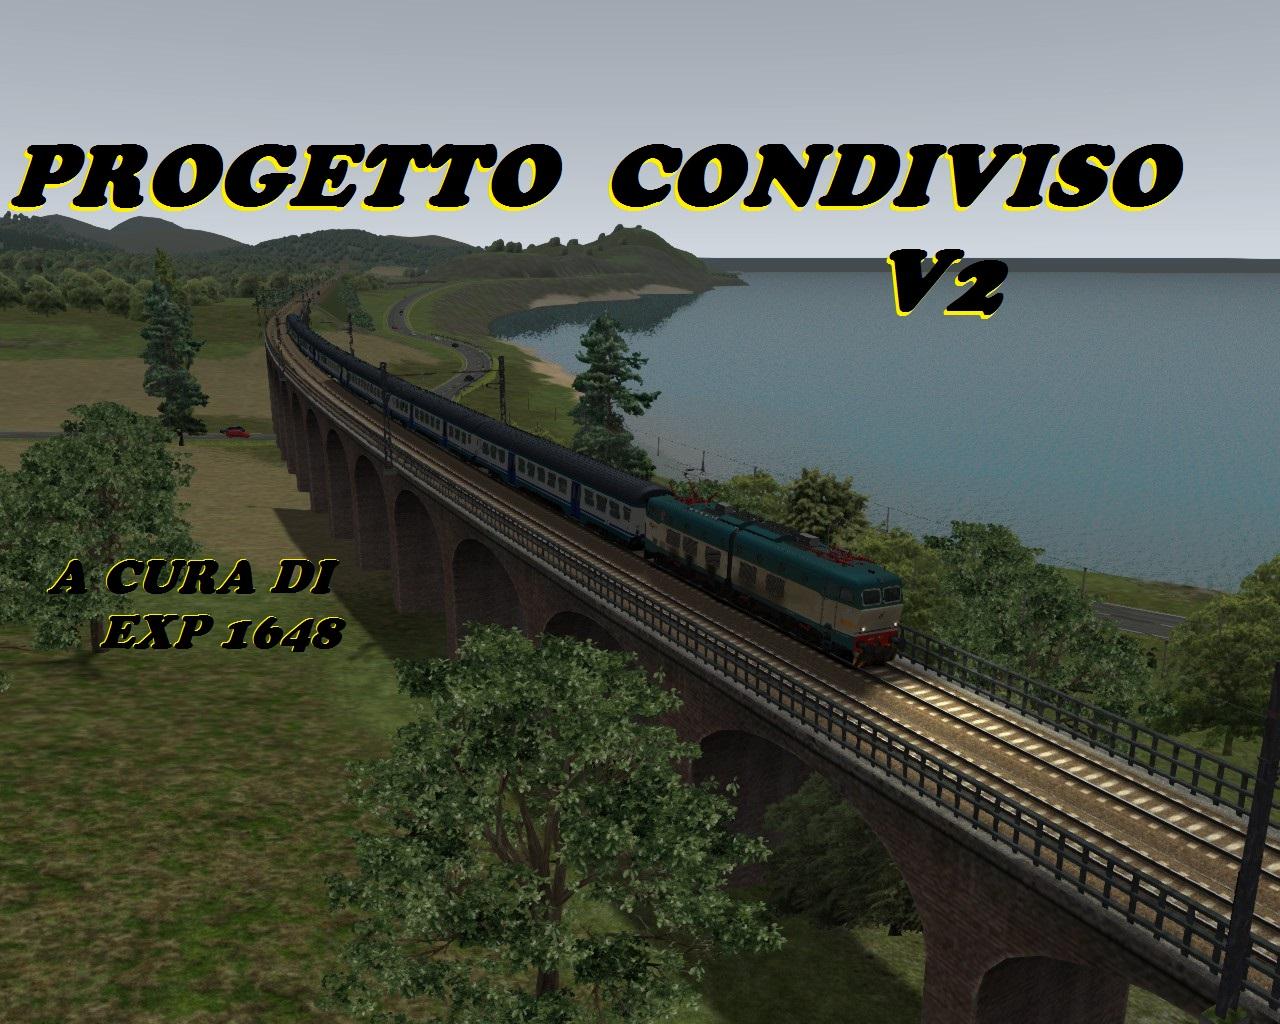 trainsimhobby.it/Rail-Works/Scenari/Progetto_Condiviso_V2.jpg